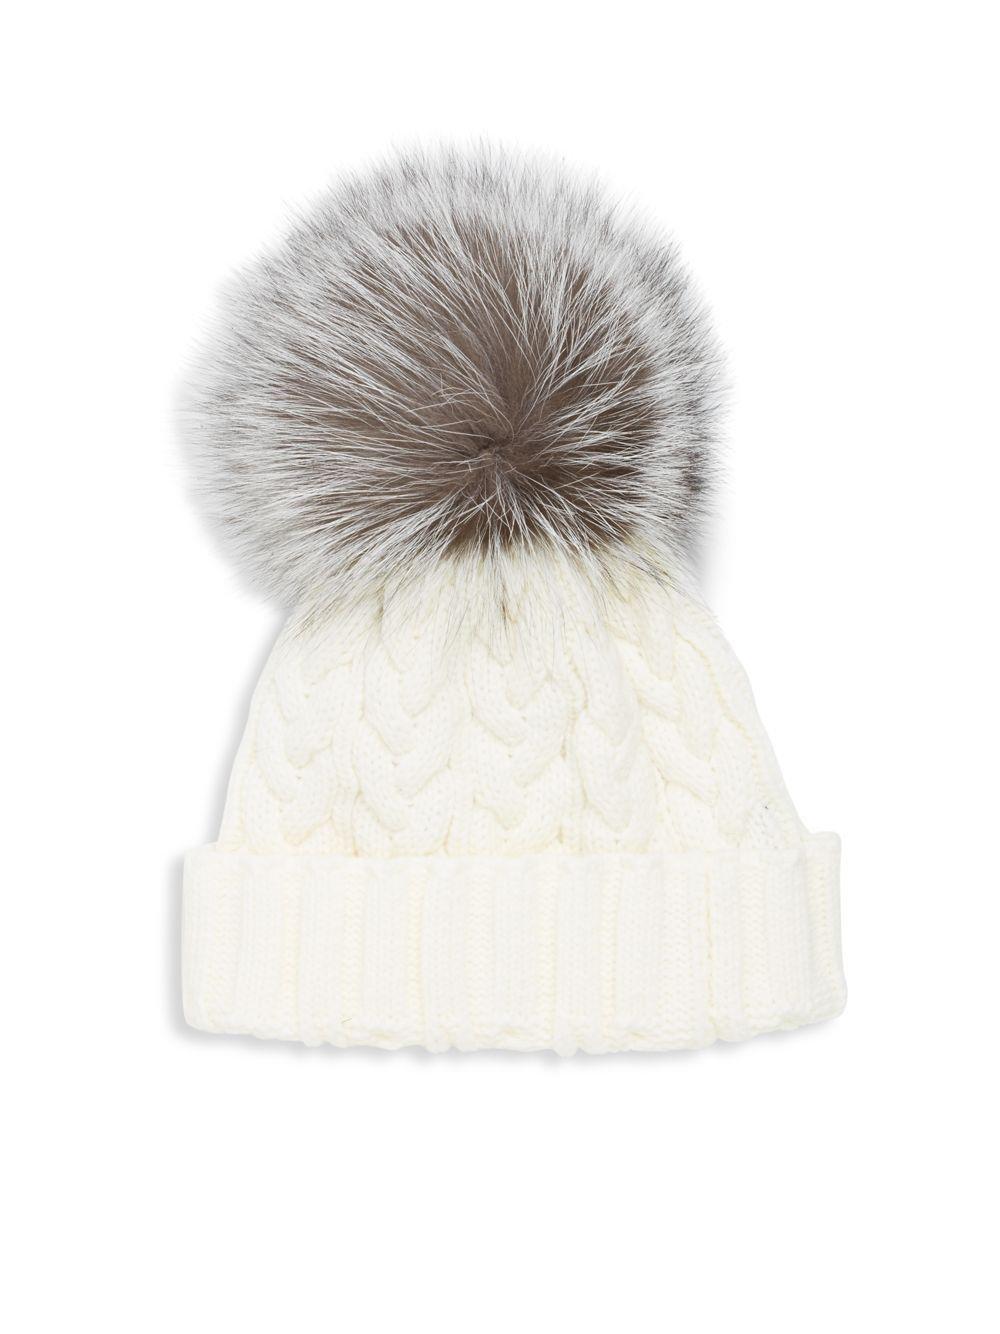 5712e5ca673 Lyst - Adrienne Landau Cable-knit Fox Fur Hat in White